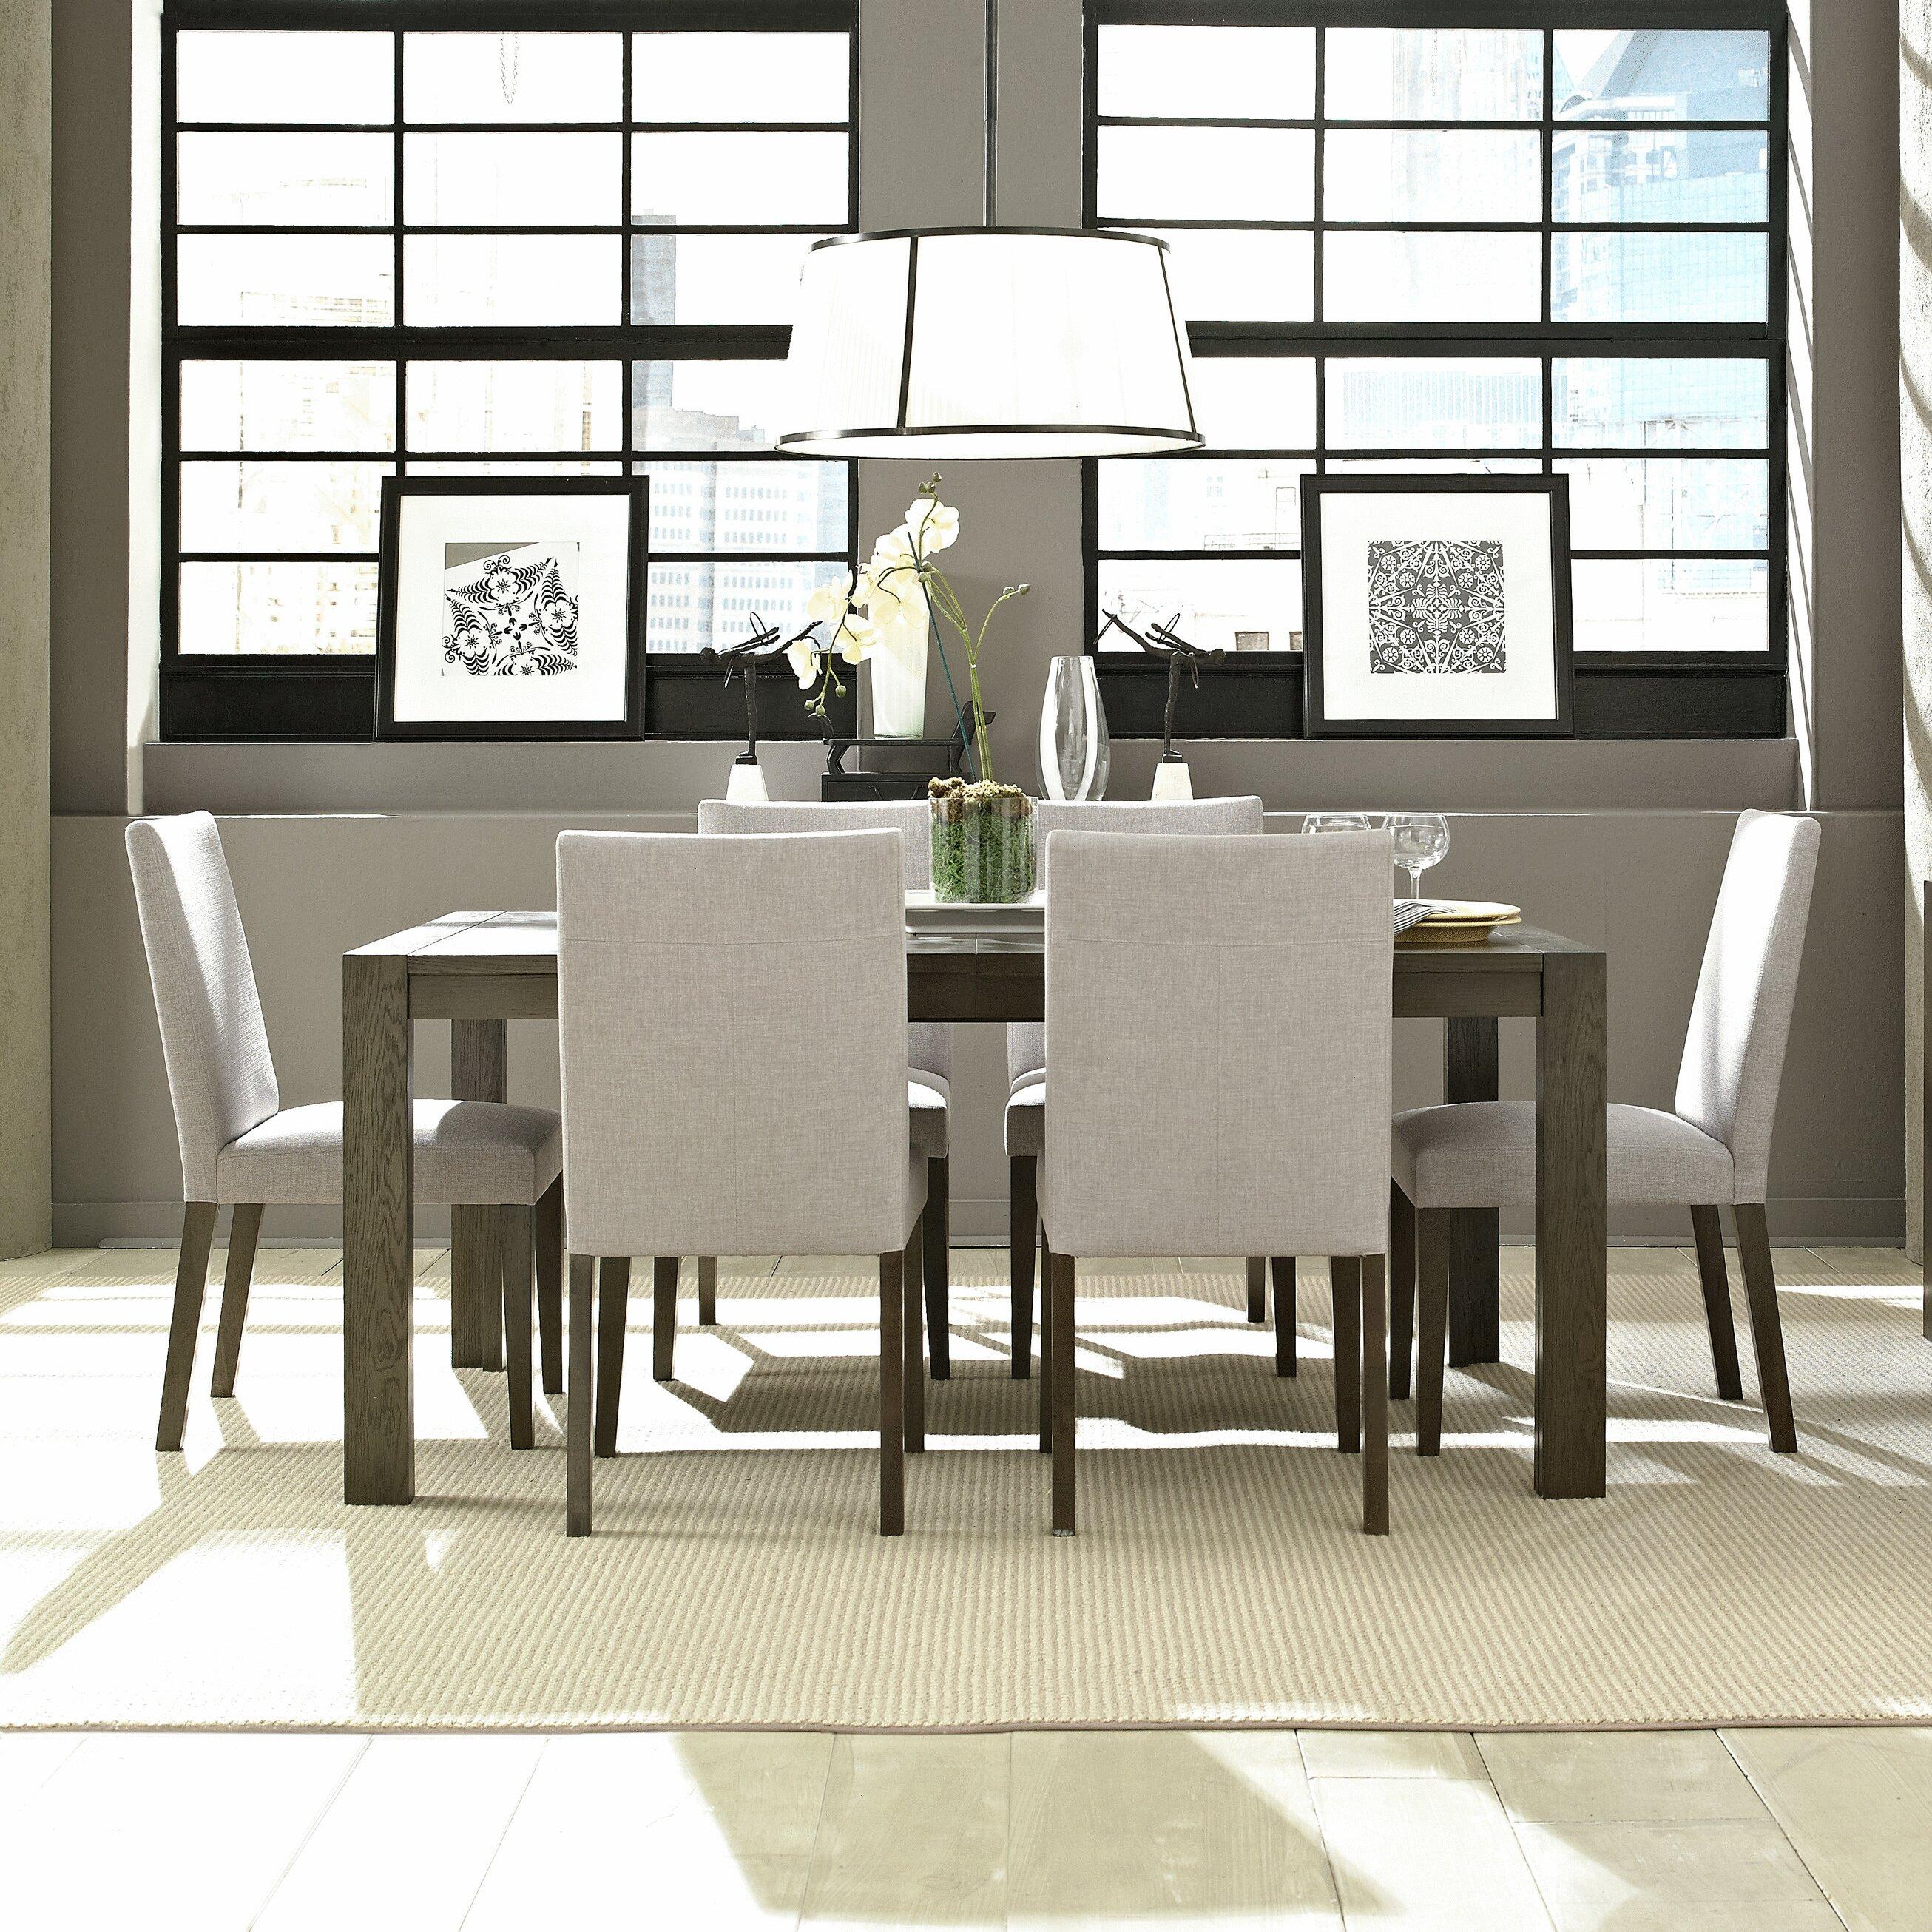 Brayden Studio Mcwhorter Dining Table Reviews: Brayden Studio Sirena Expanded Dining Table & Reviews